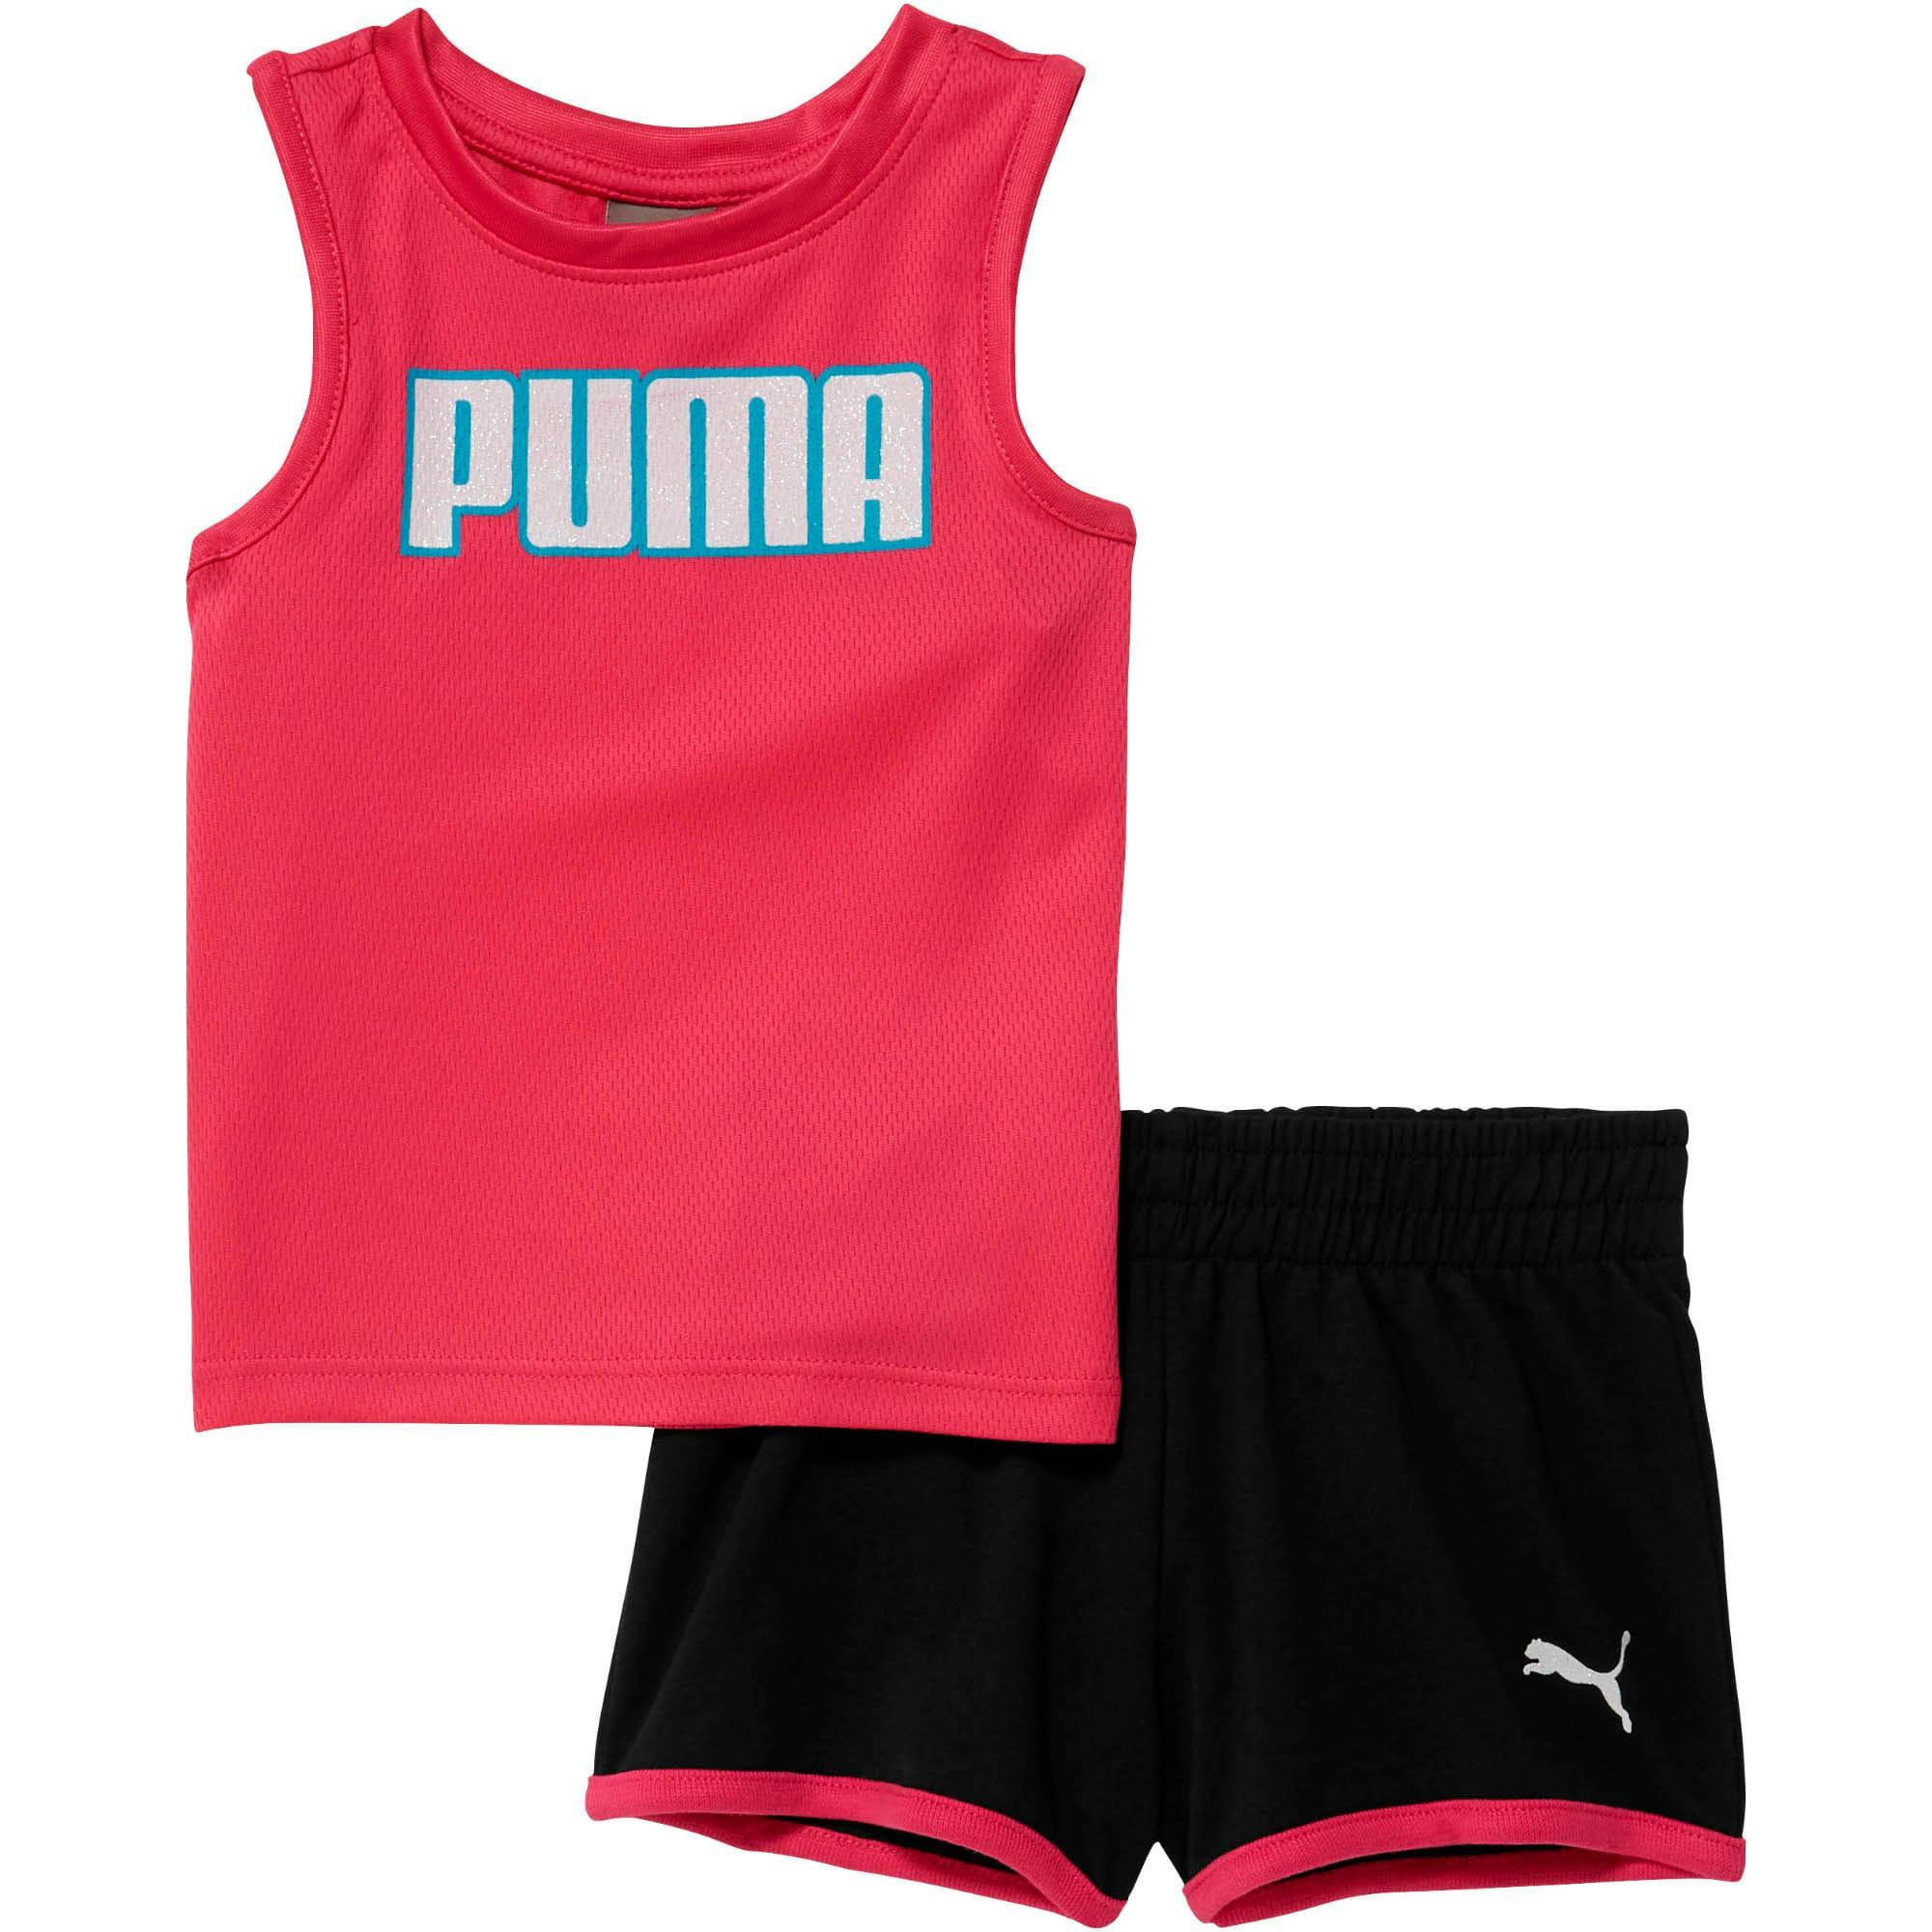 Thumbnail 1 of Infant + Toddler Mesh Fashion Tank + Shorts Set, FUCHSIA PURPLE, medium